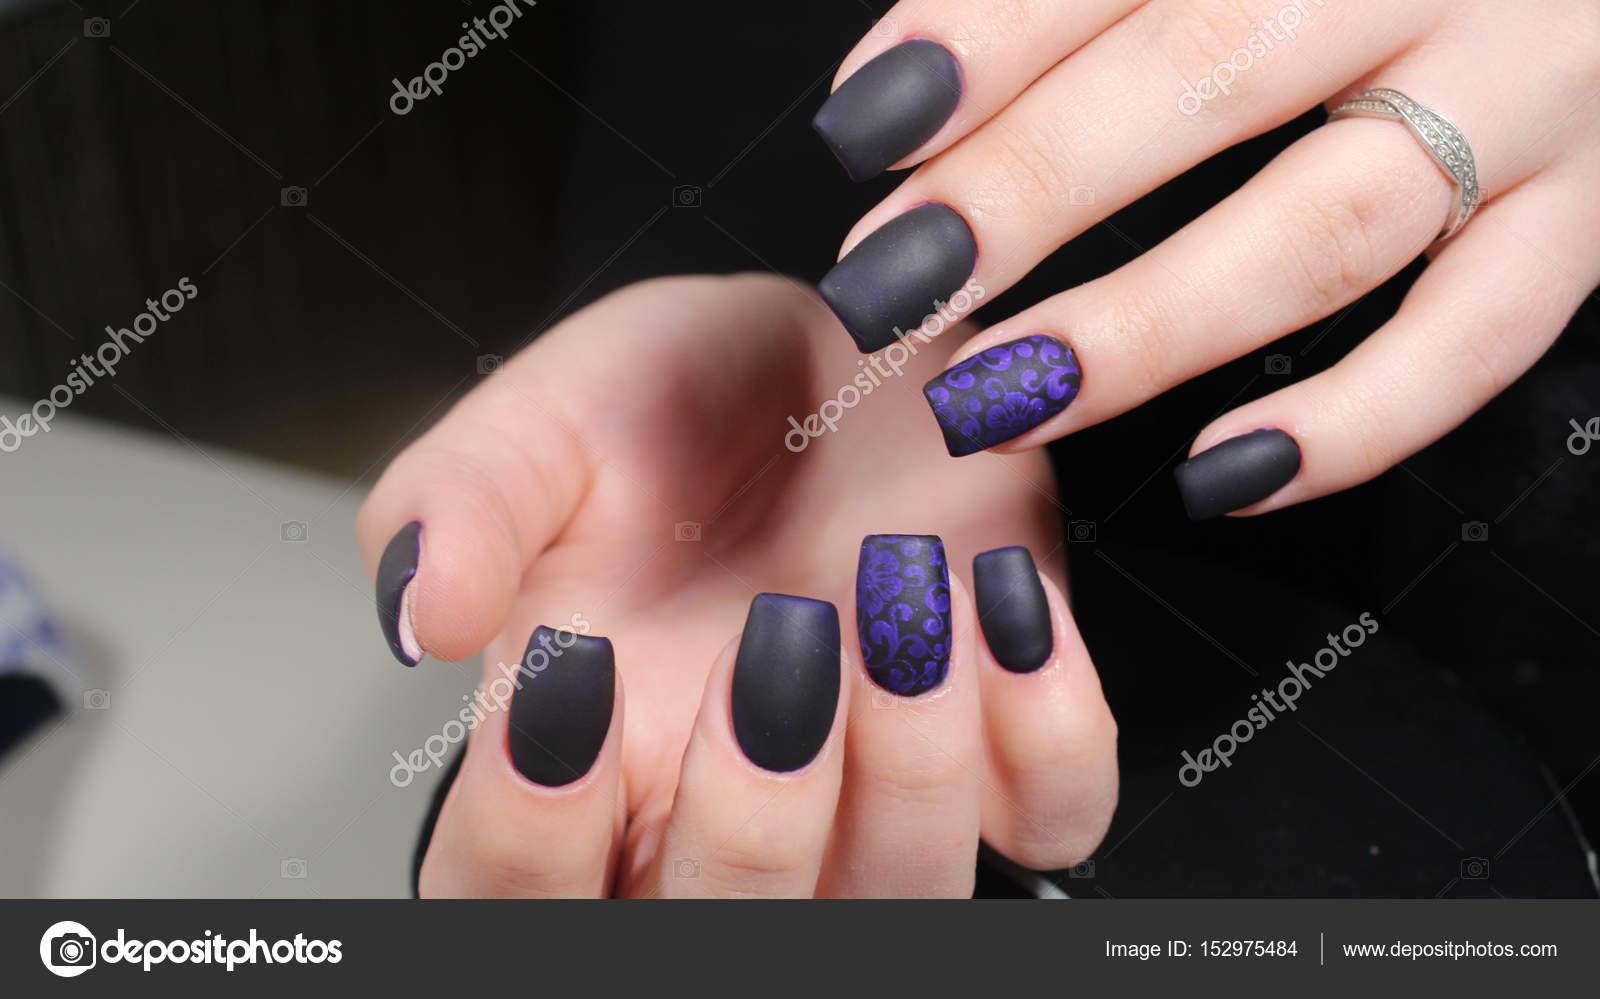 Black And Blue Nail Designs Design Of Manicure Matt Black And Blue Nails Stock Photo C Smirmaxstock 152975484